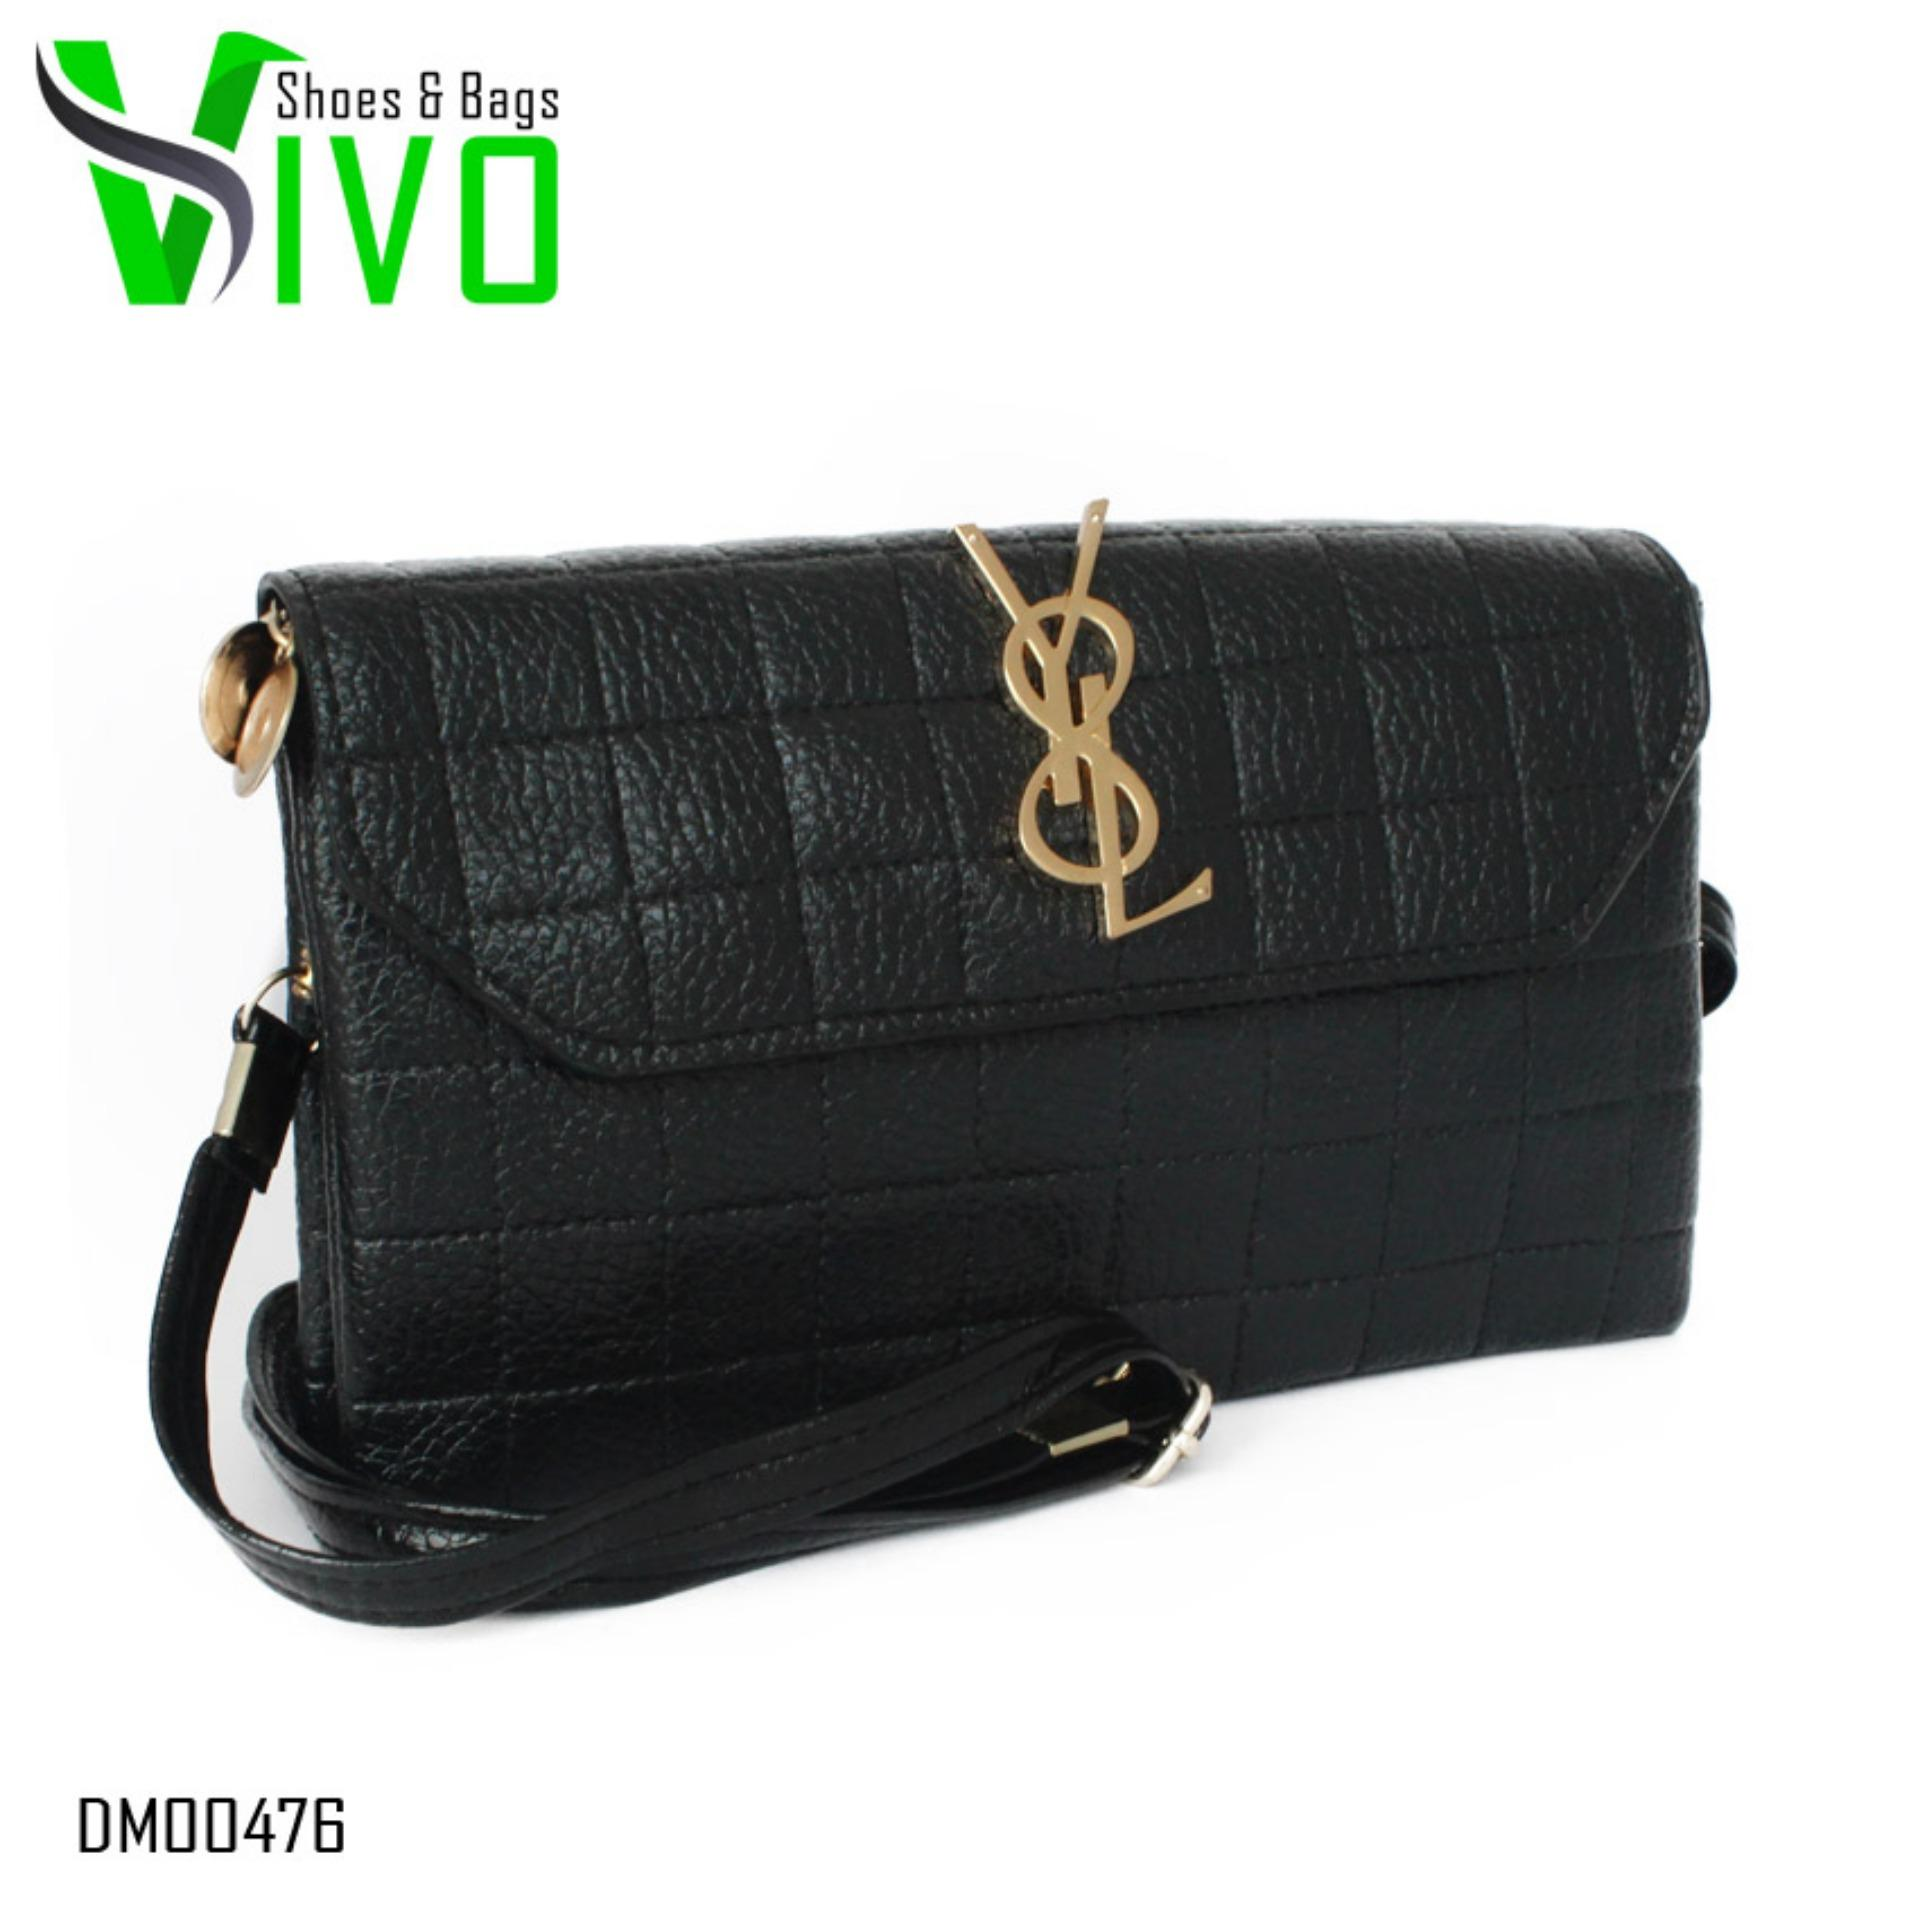 Vivo Shoes   Bags Tas Wanita  Tas Murah  Tas Import Clutch Slingbag b4ea517350